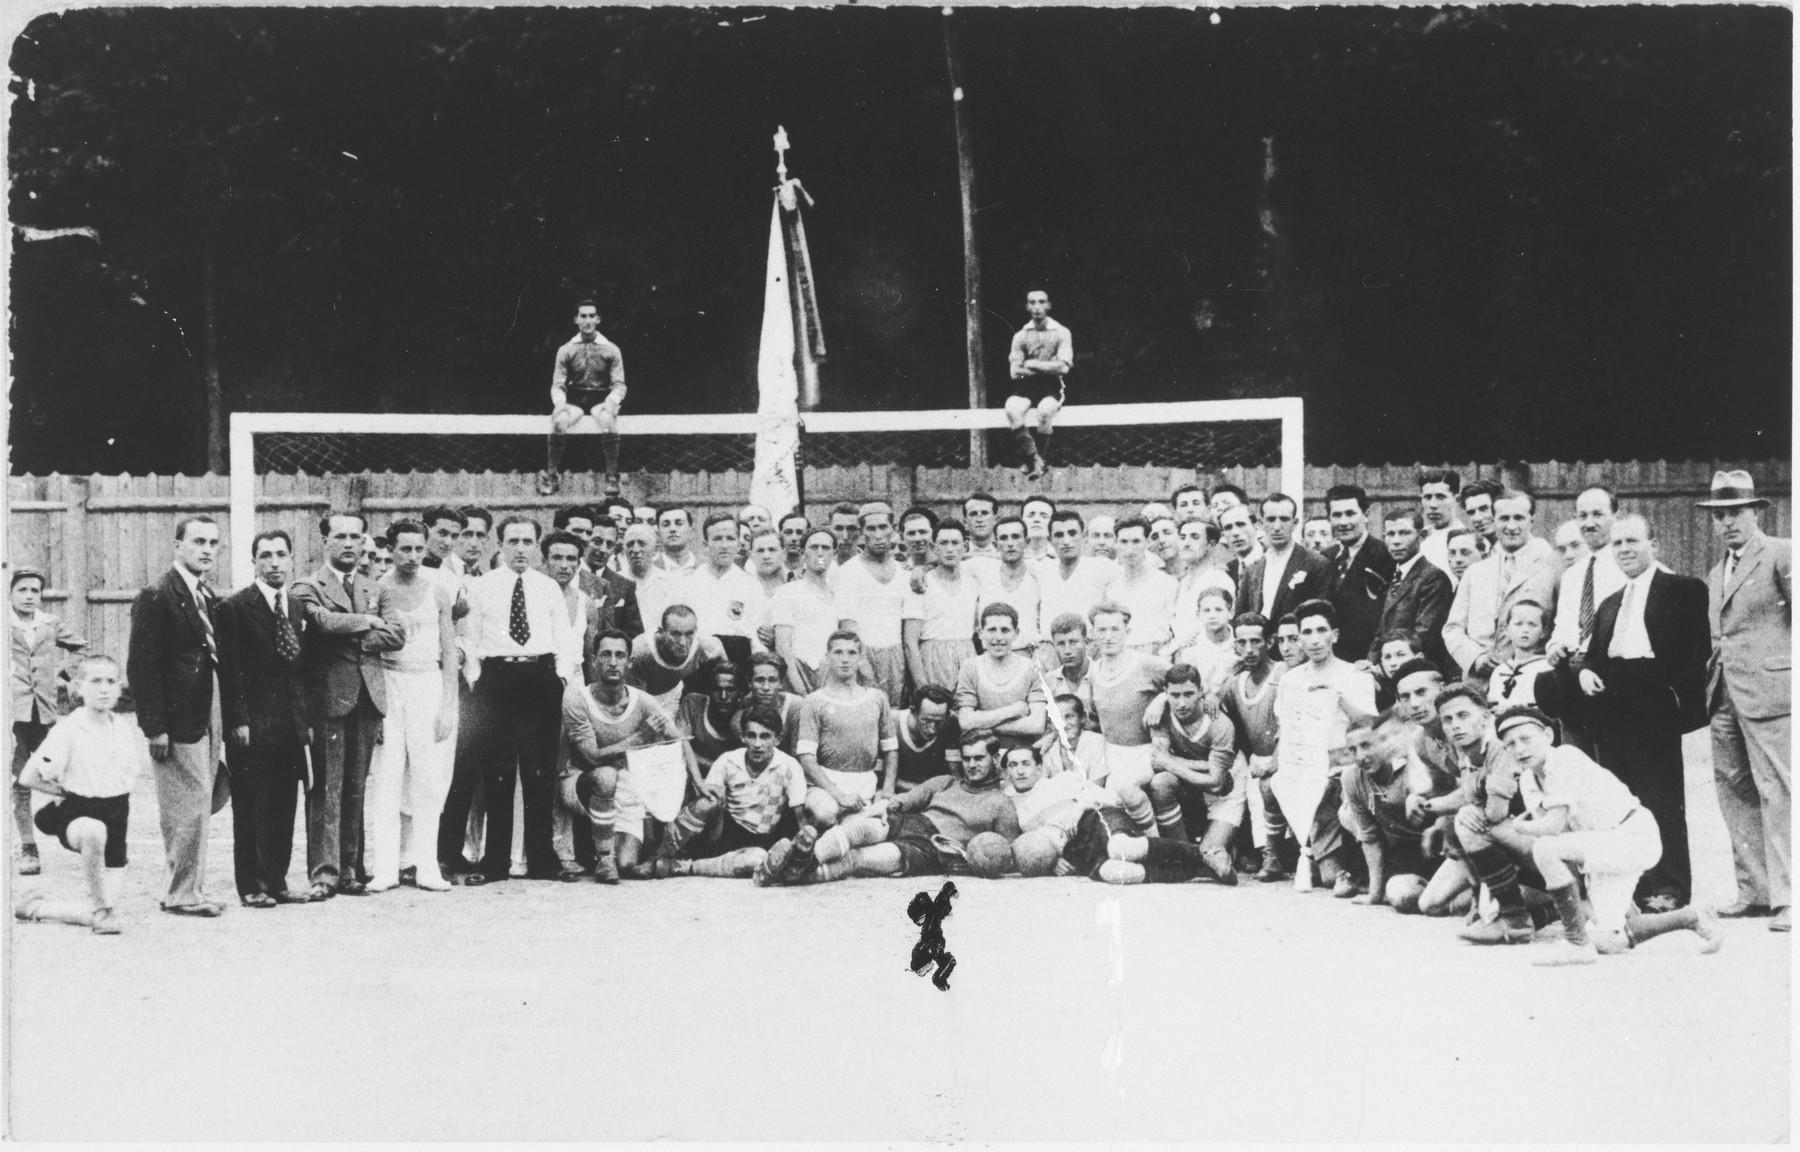 Members of the Samson soccer club in Sighet.  Those pictured include the captain, Gavaler, Yossy Kaufman, Herman Tessler and Khunoh Tessler.